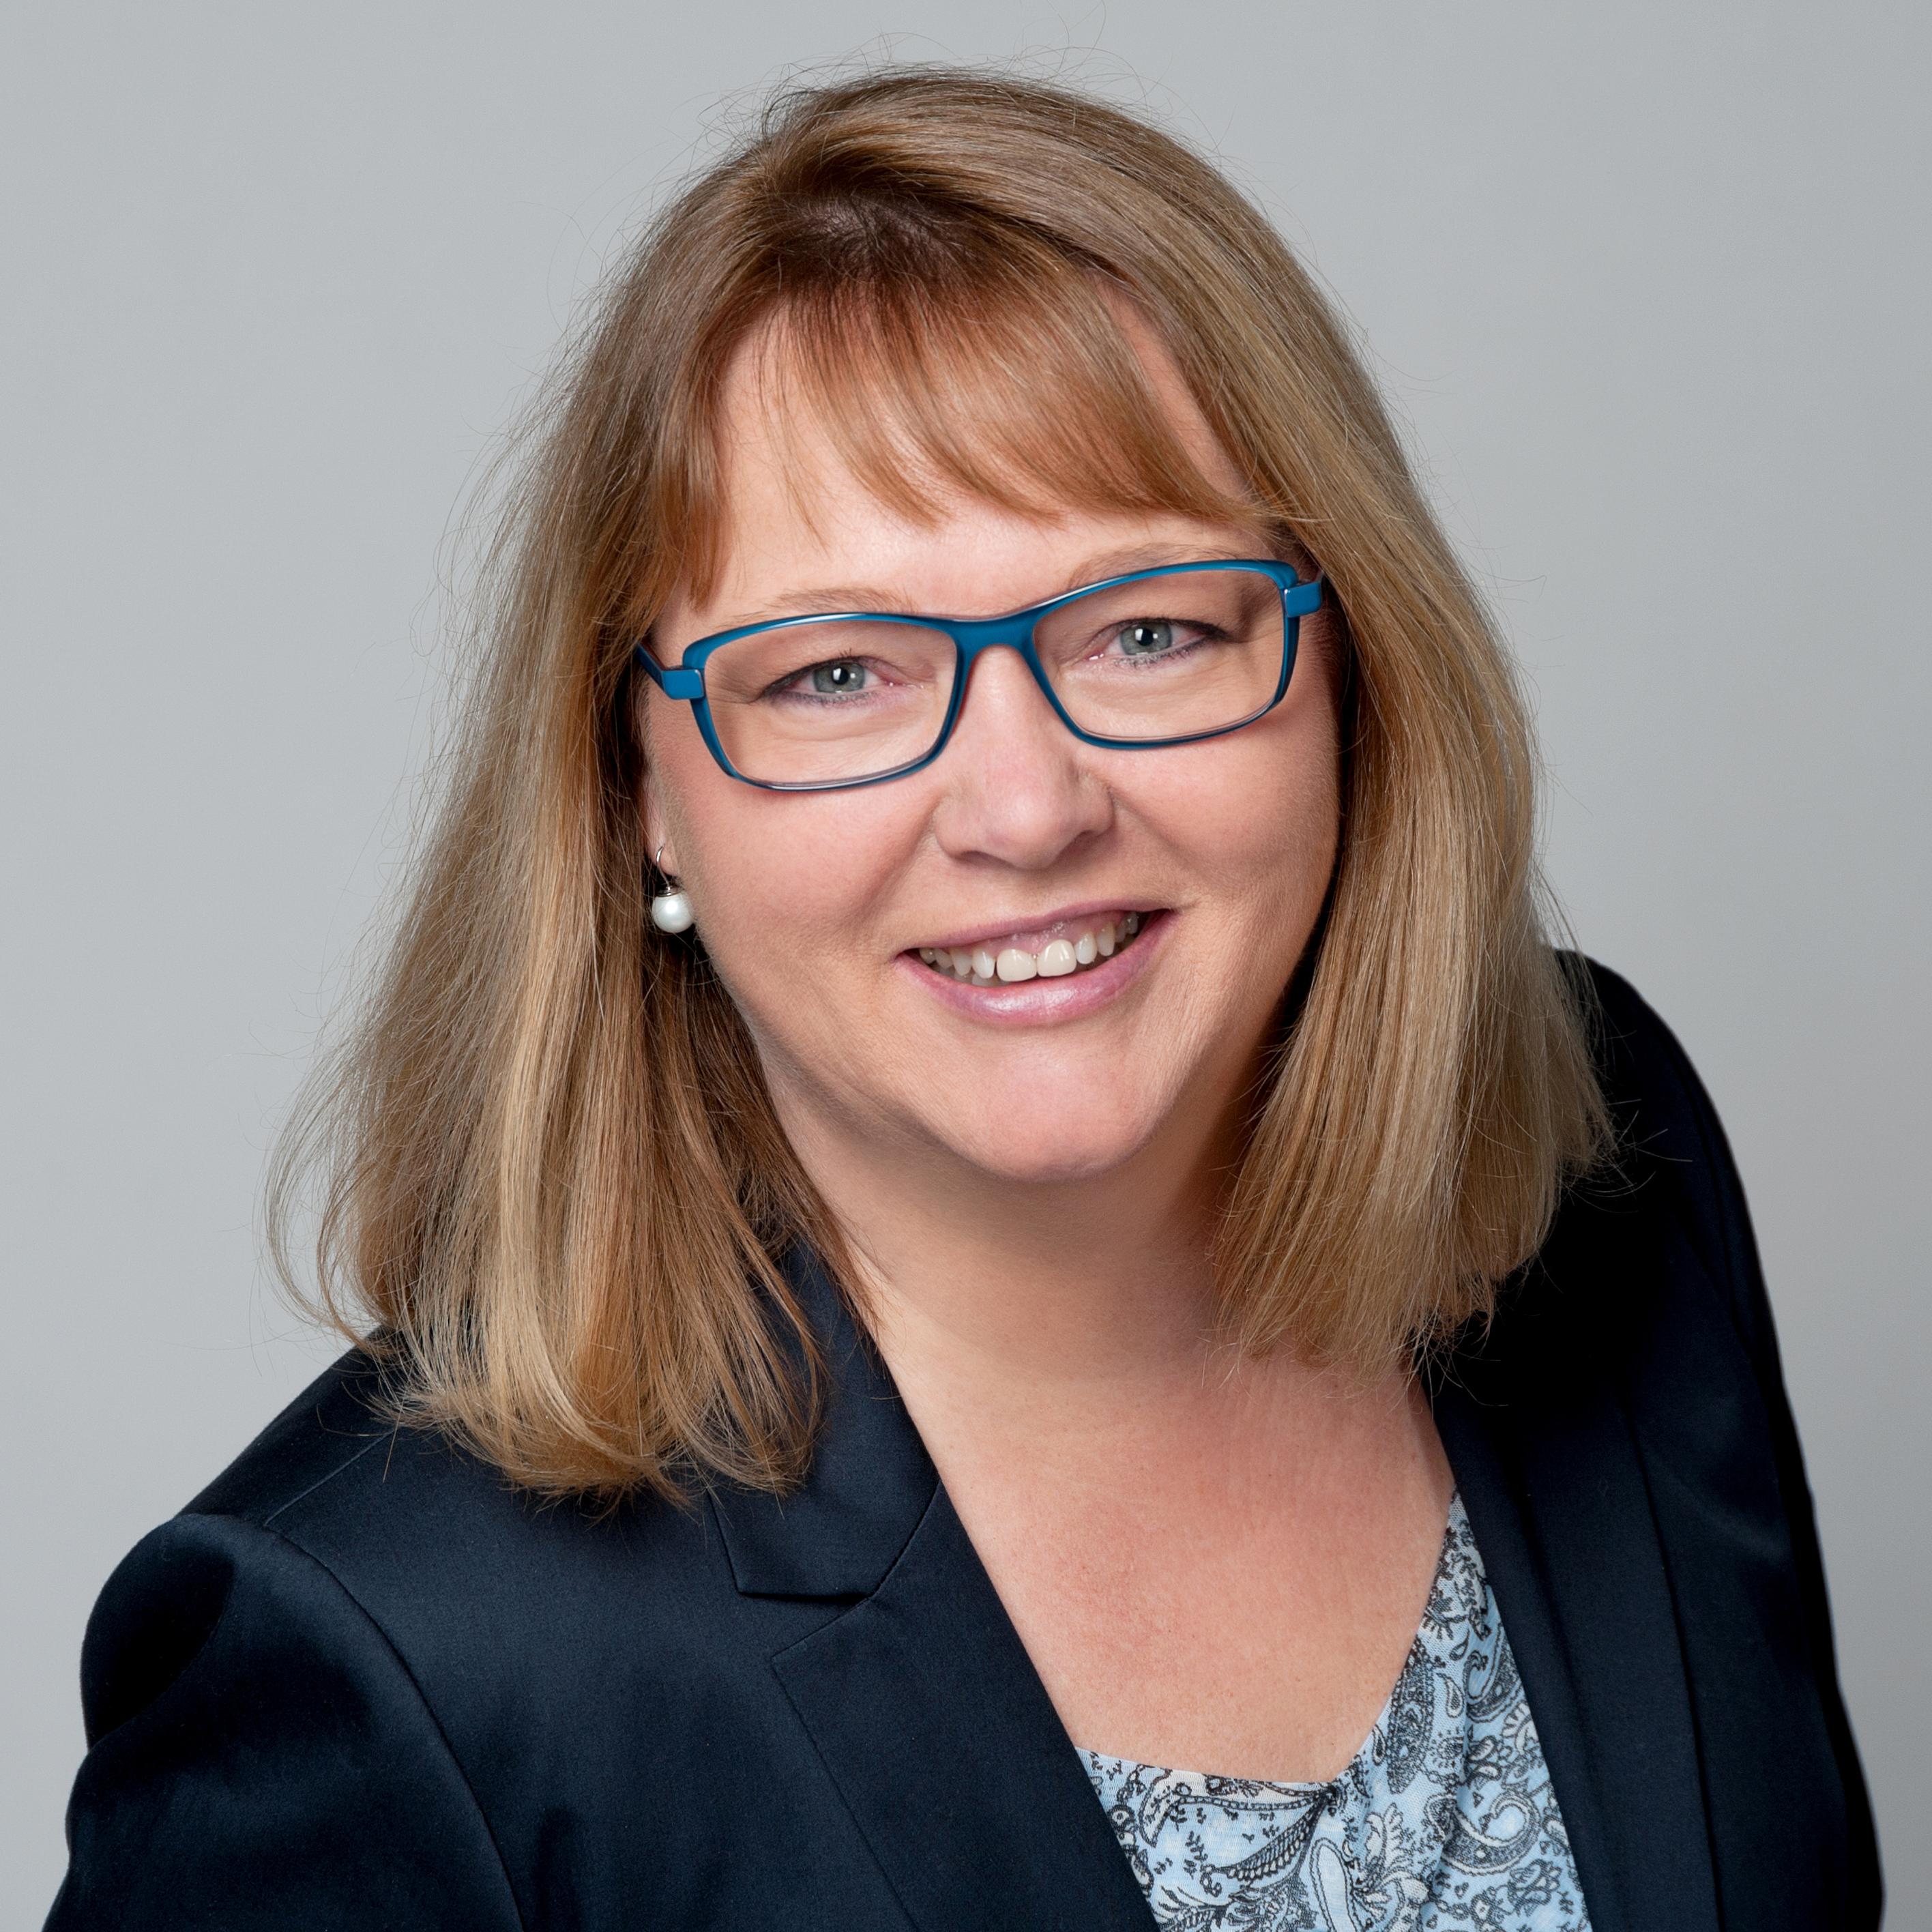 Sabine Laakmann, Heilpraktikerin